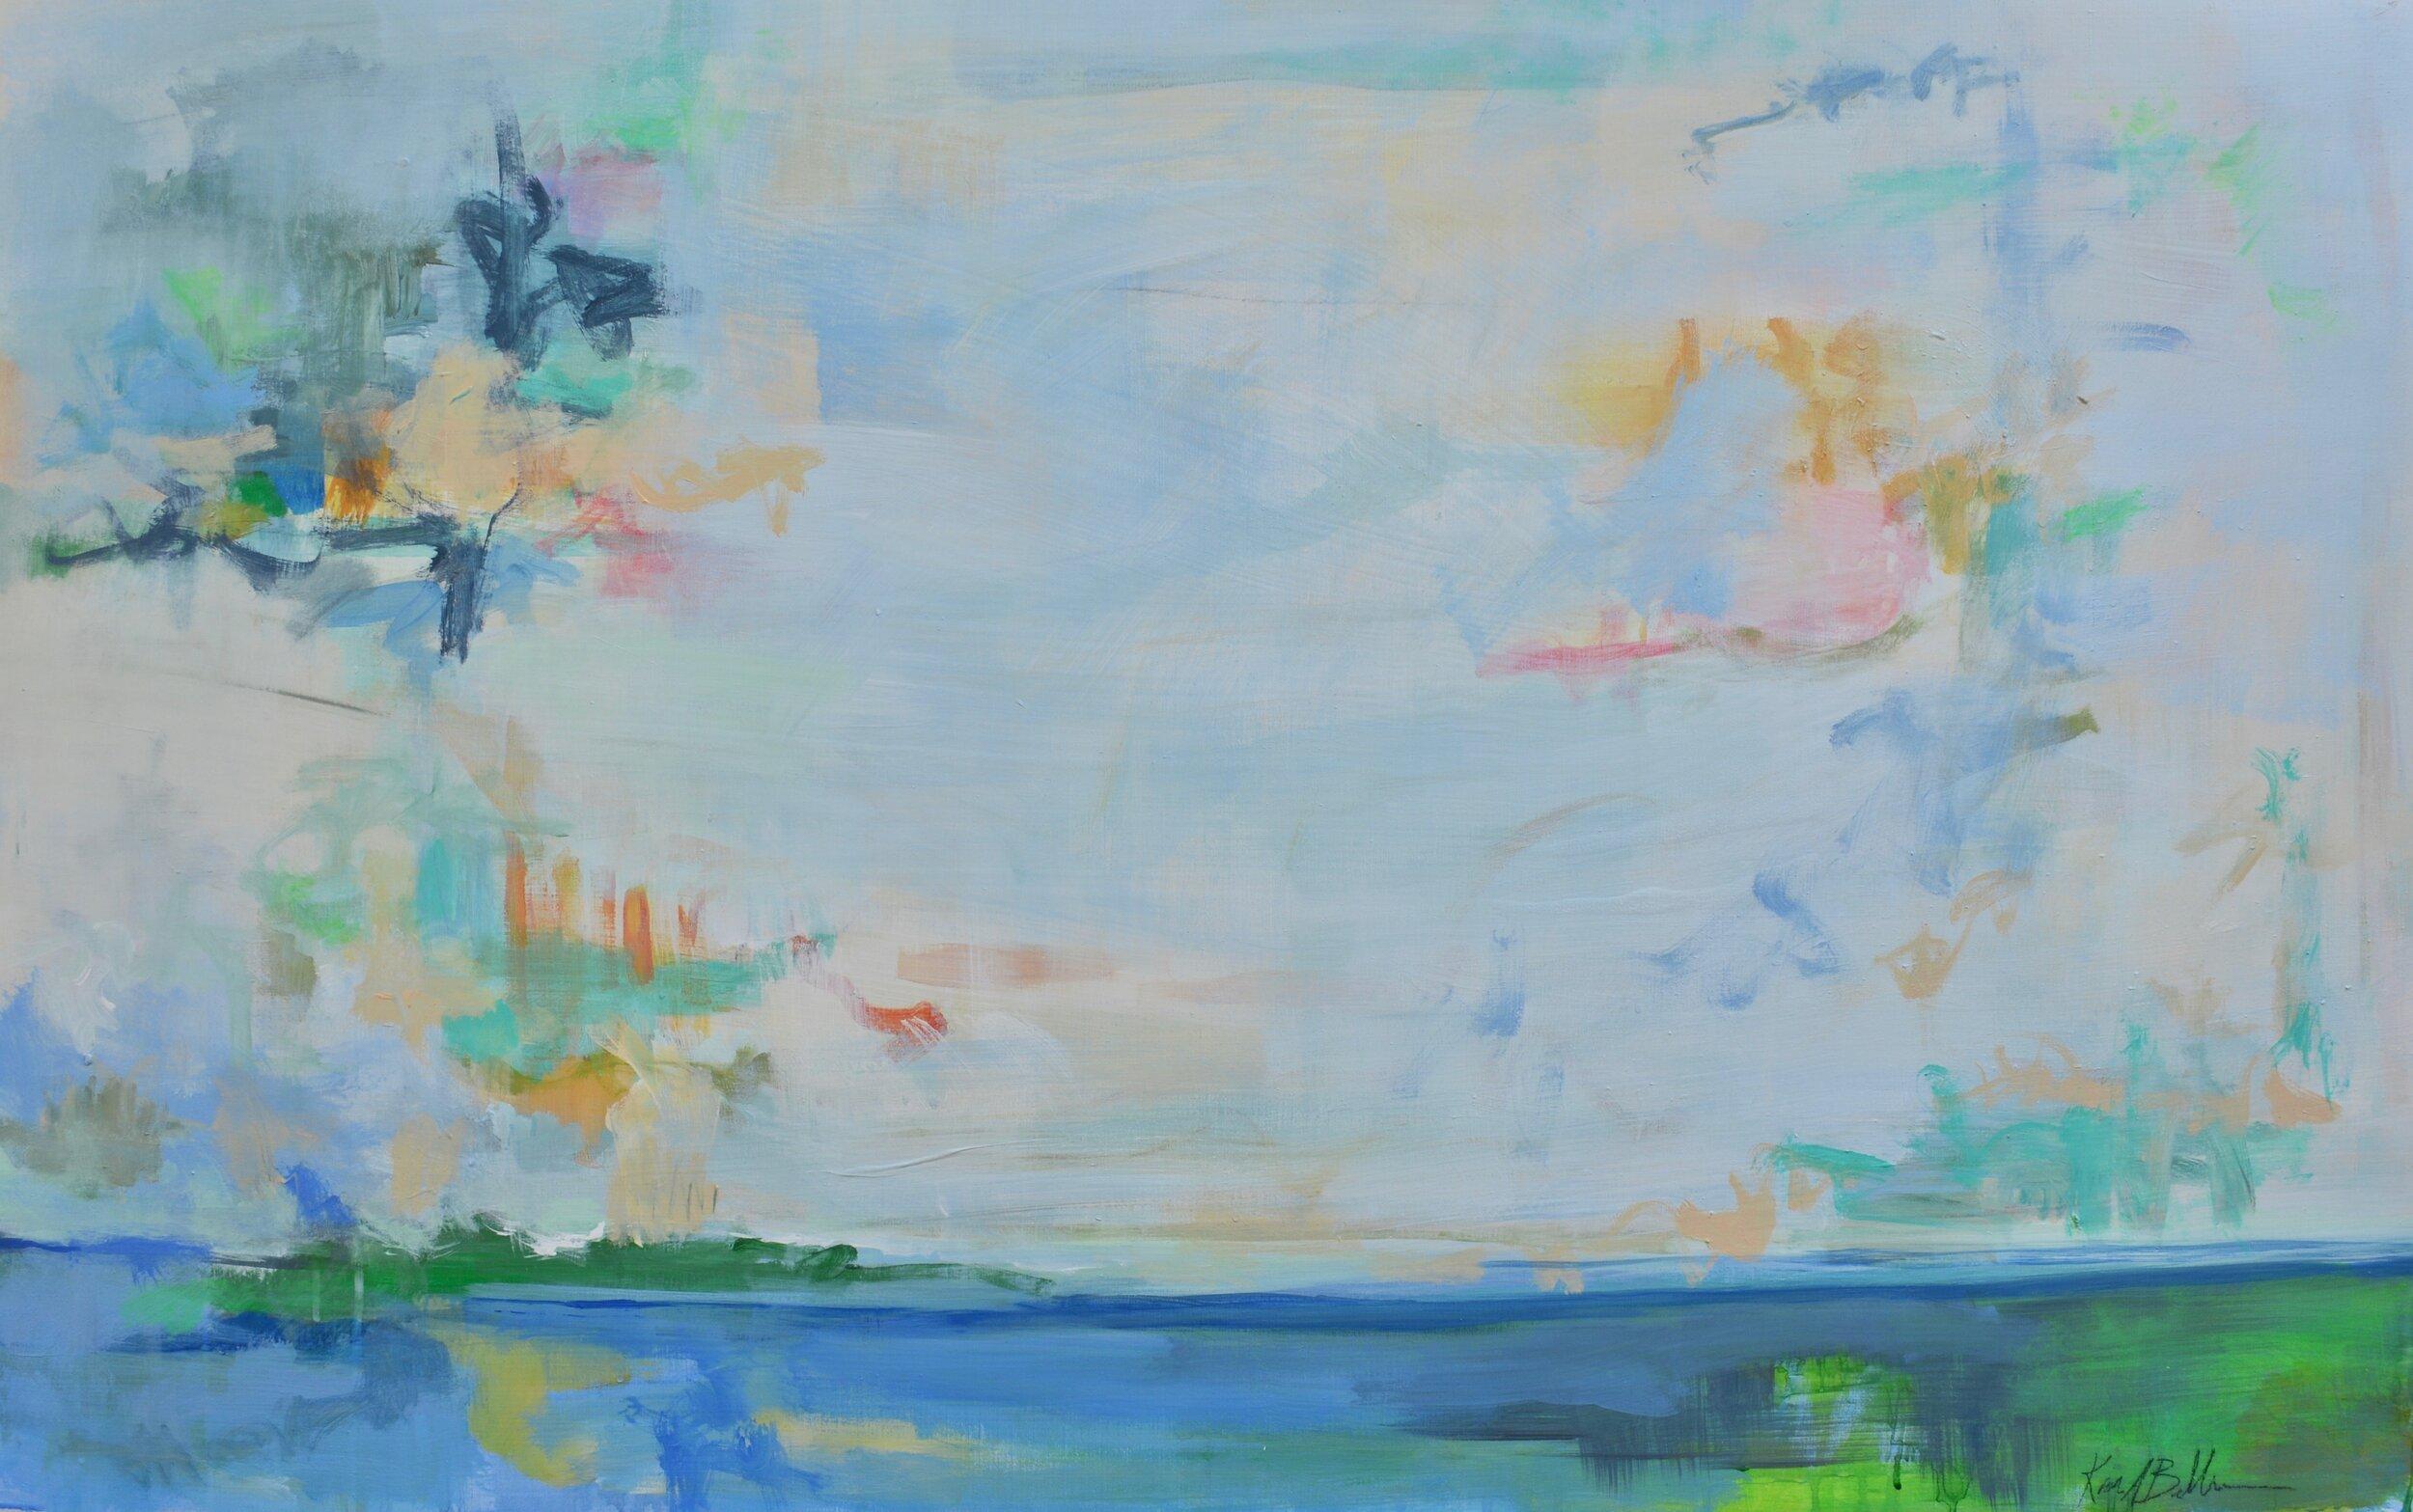 "Blue Horizon 1 - 48"" x 30"" mixed media on panel$1200"